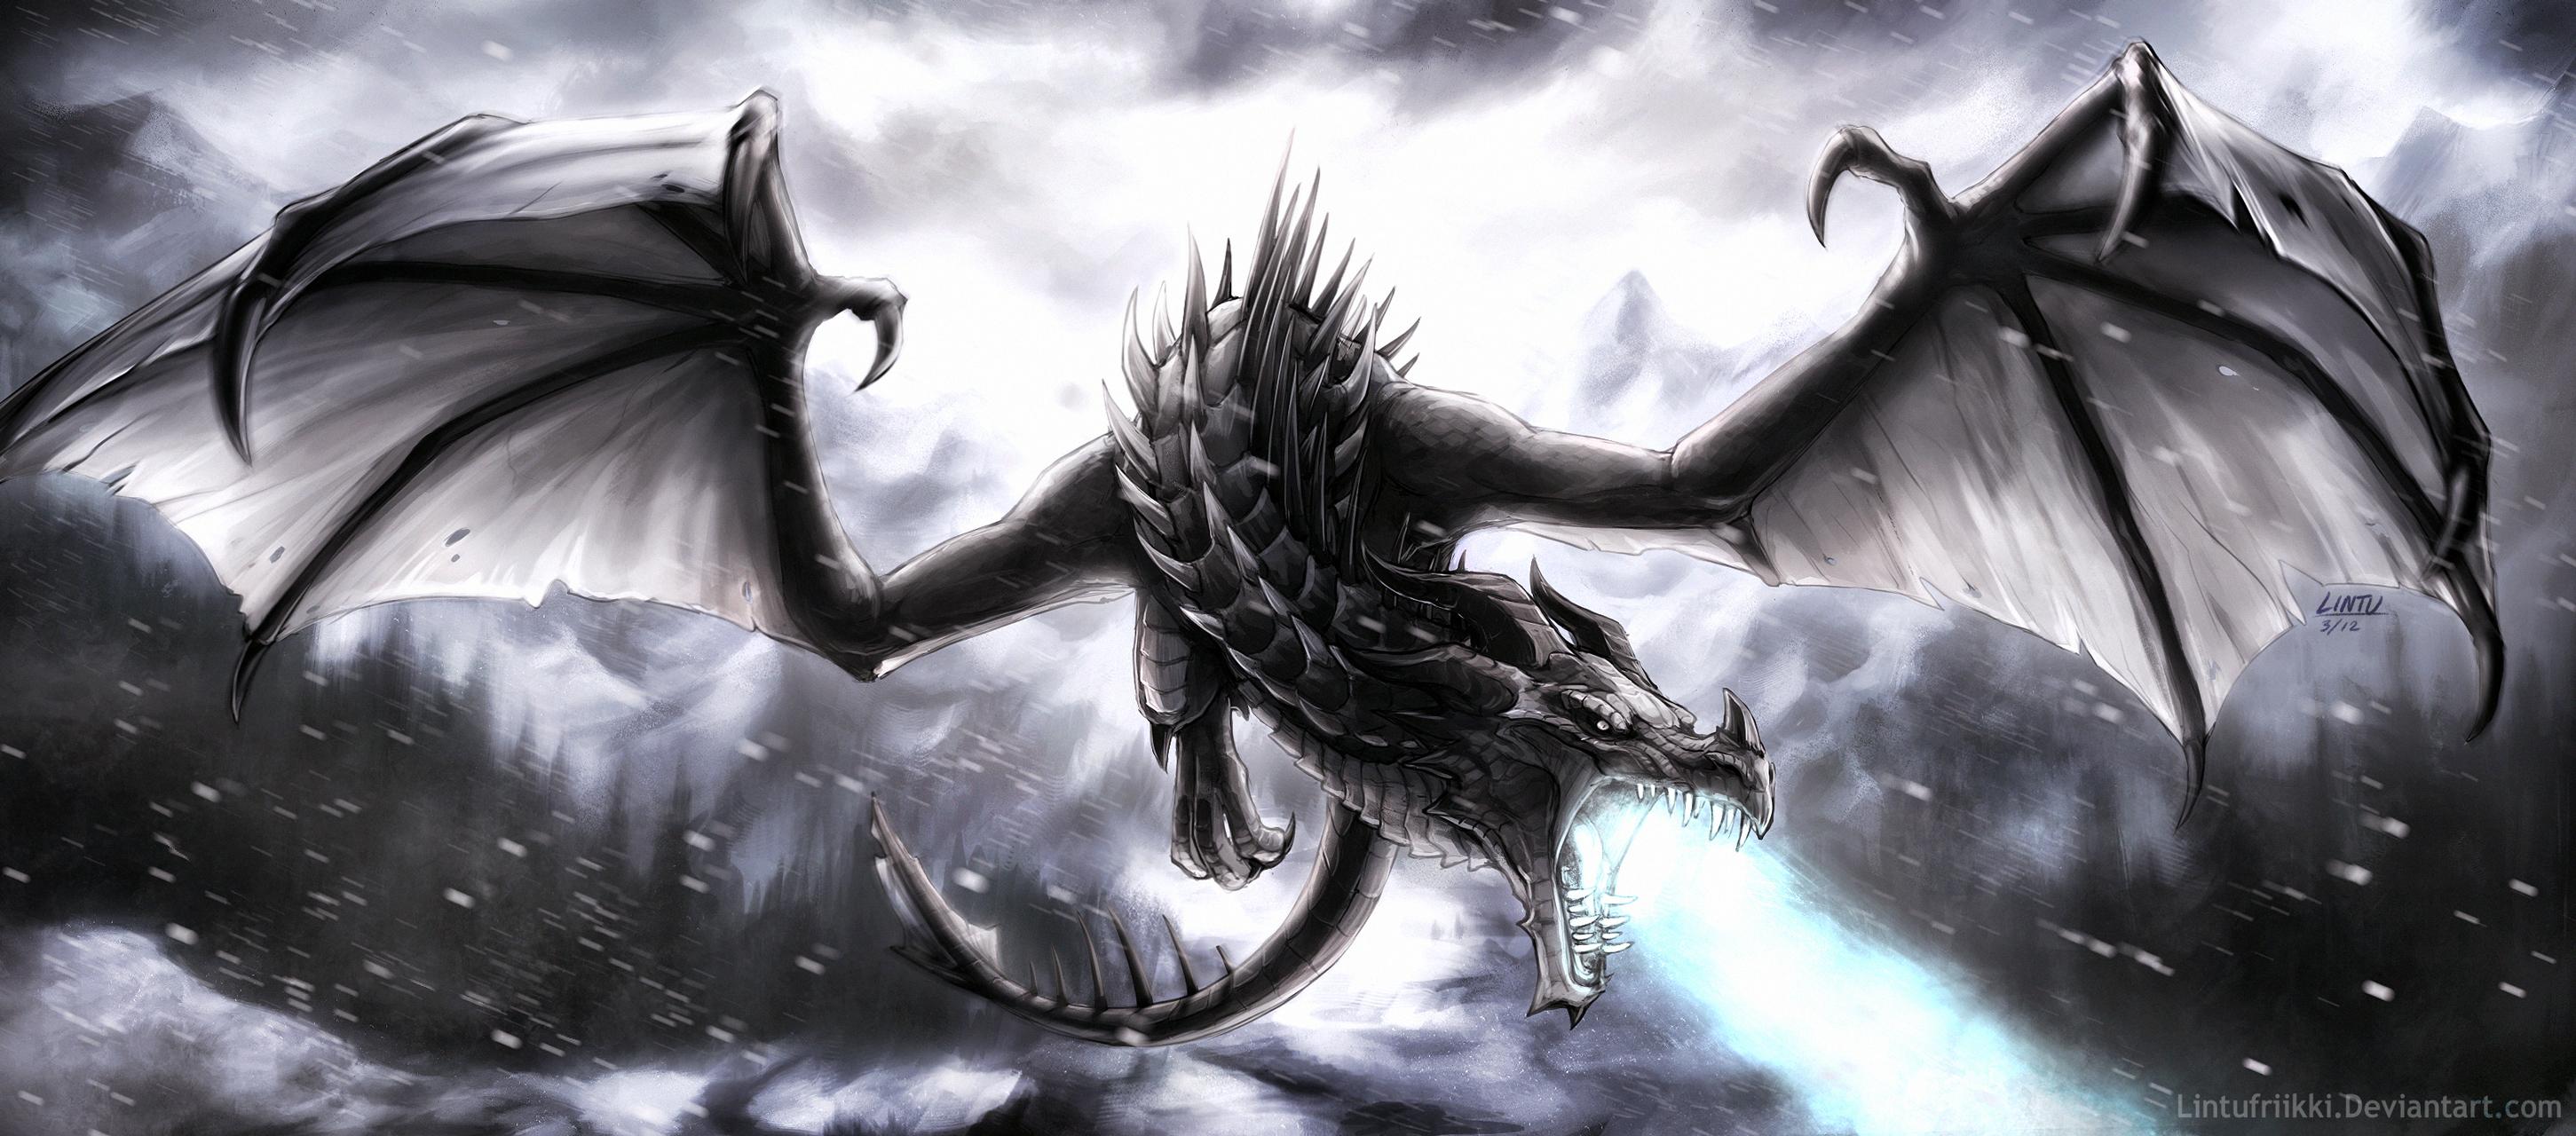 Frost dragon by Lintufriikki on DeviantArt